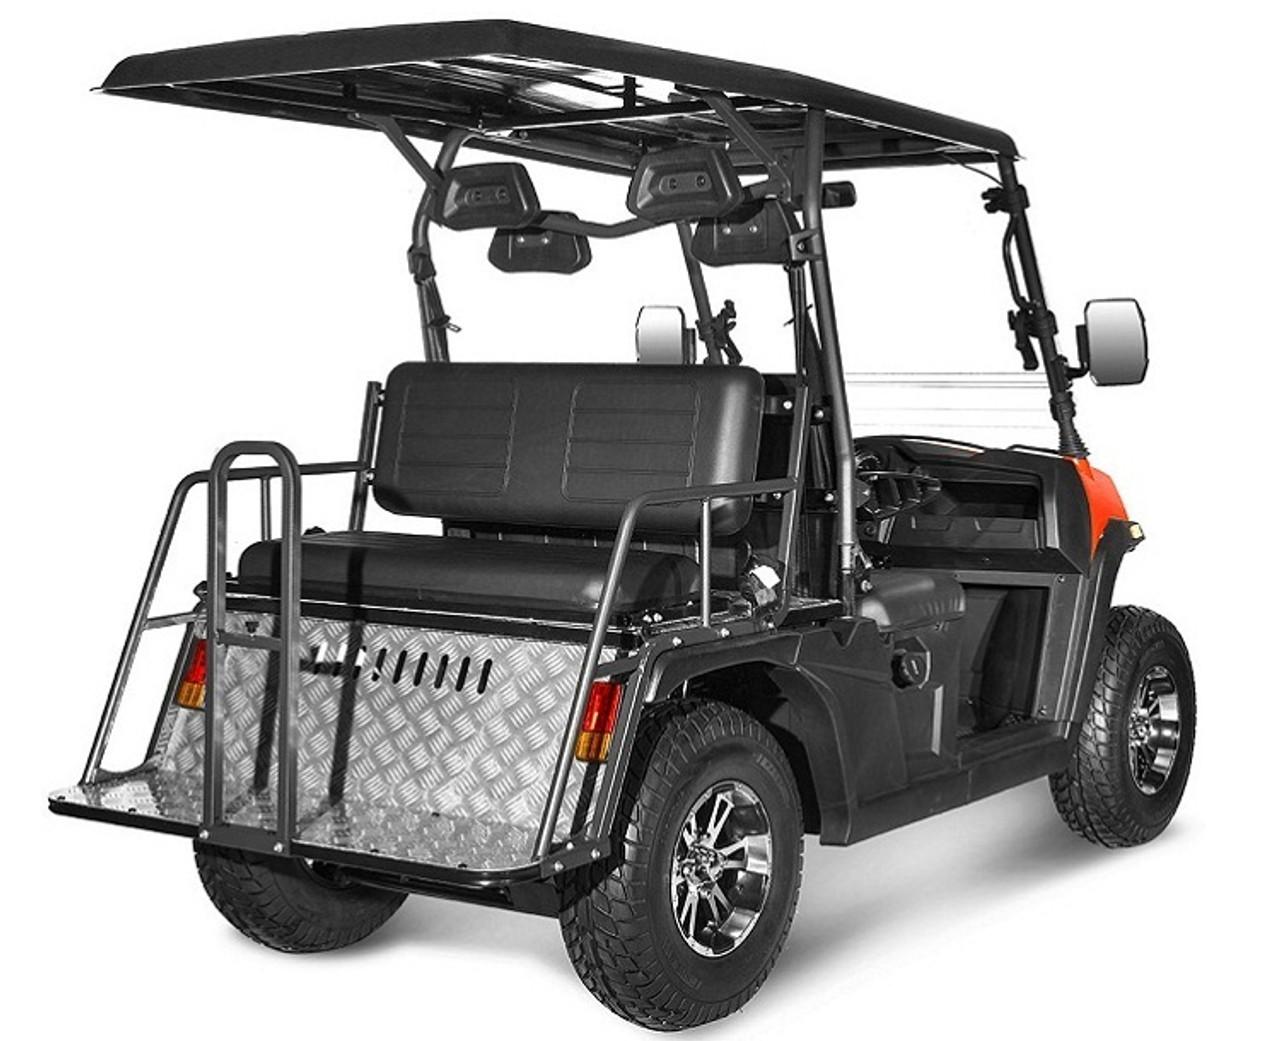 Burgundy - Vitacci Rover-200 EFI 169cc (Golf Cart) UTV, 4-stroke, Single-cylinder, Oil-cooled